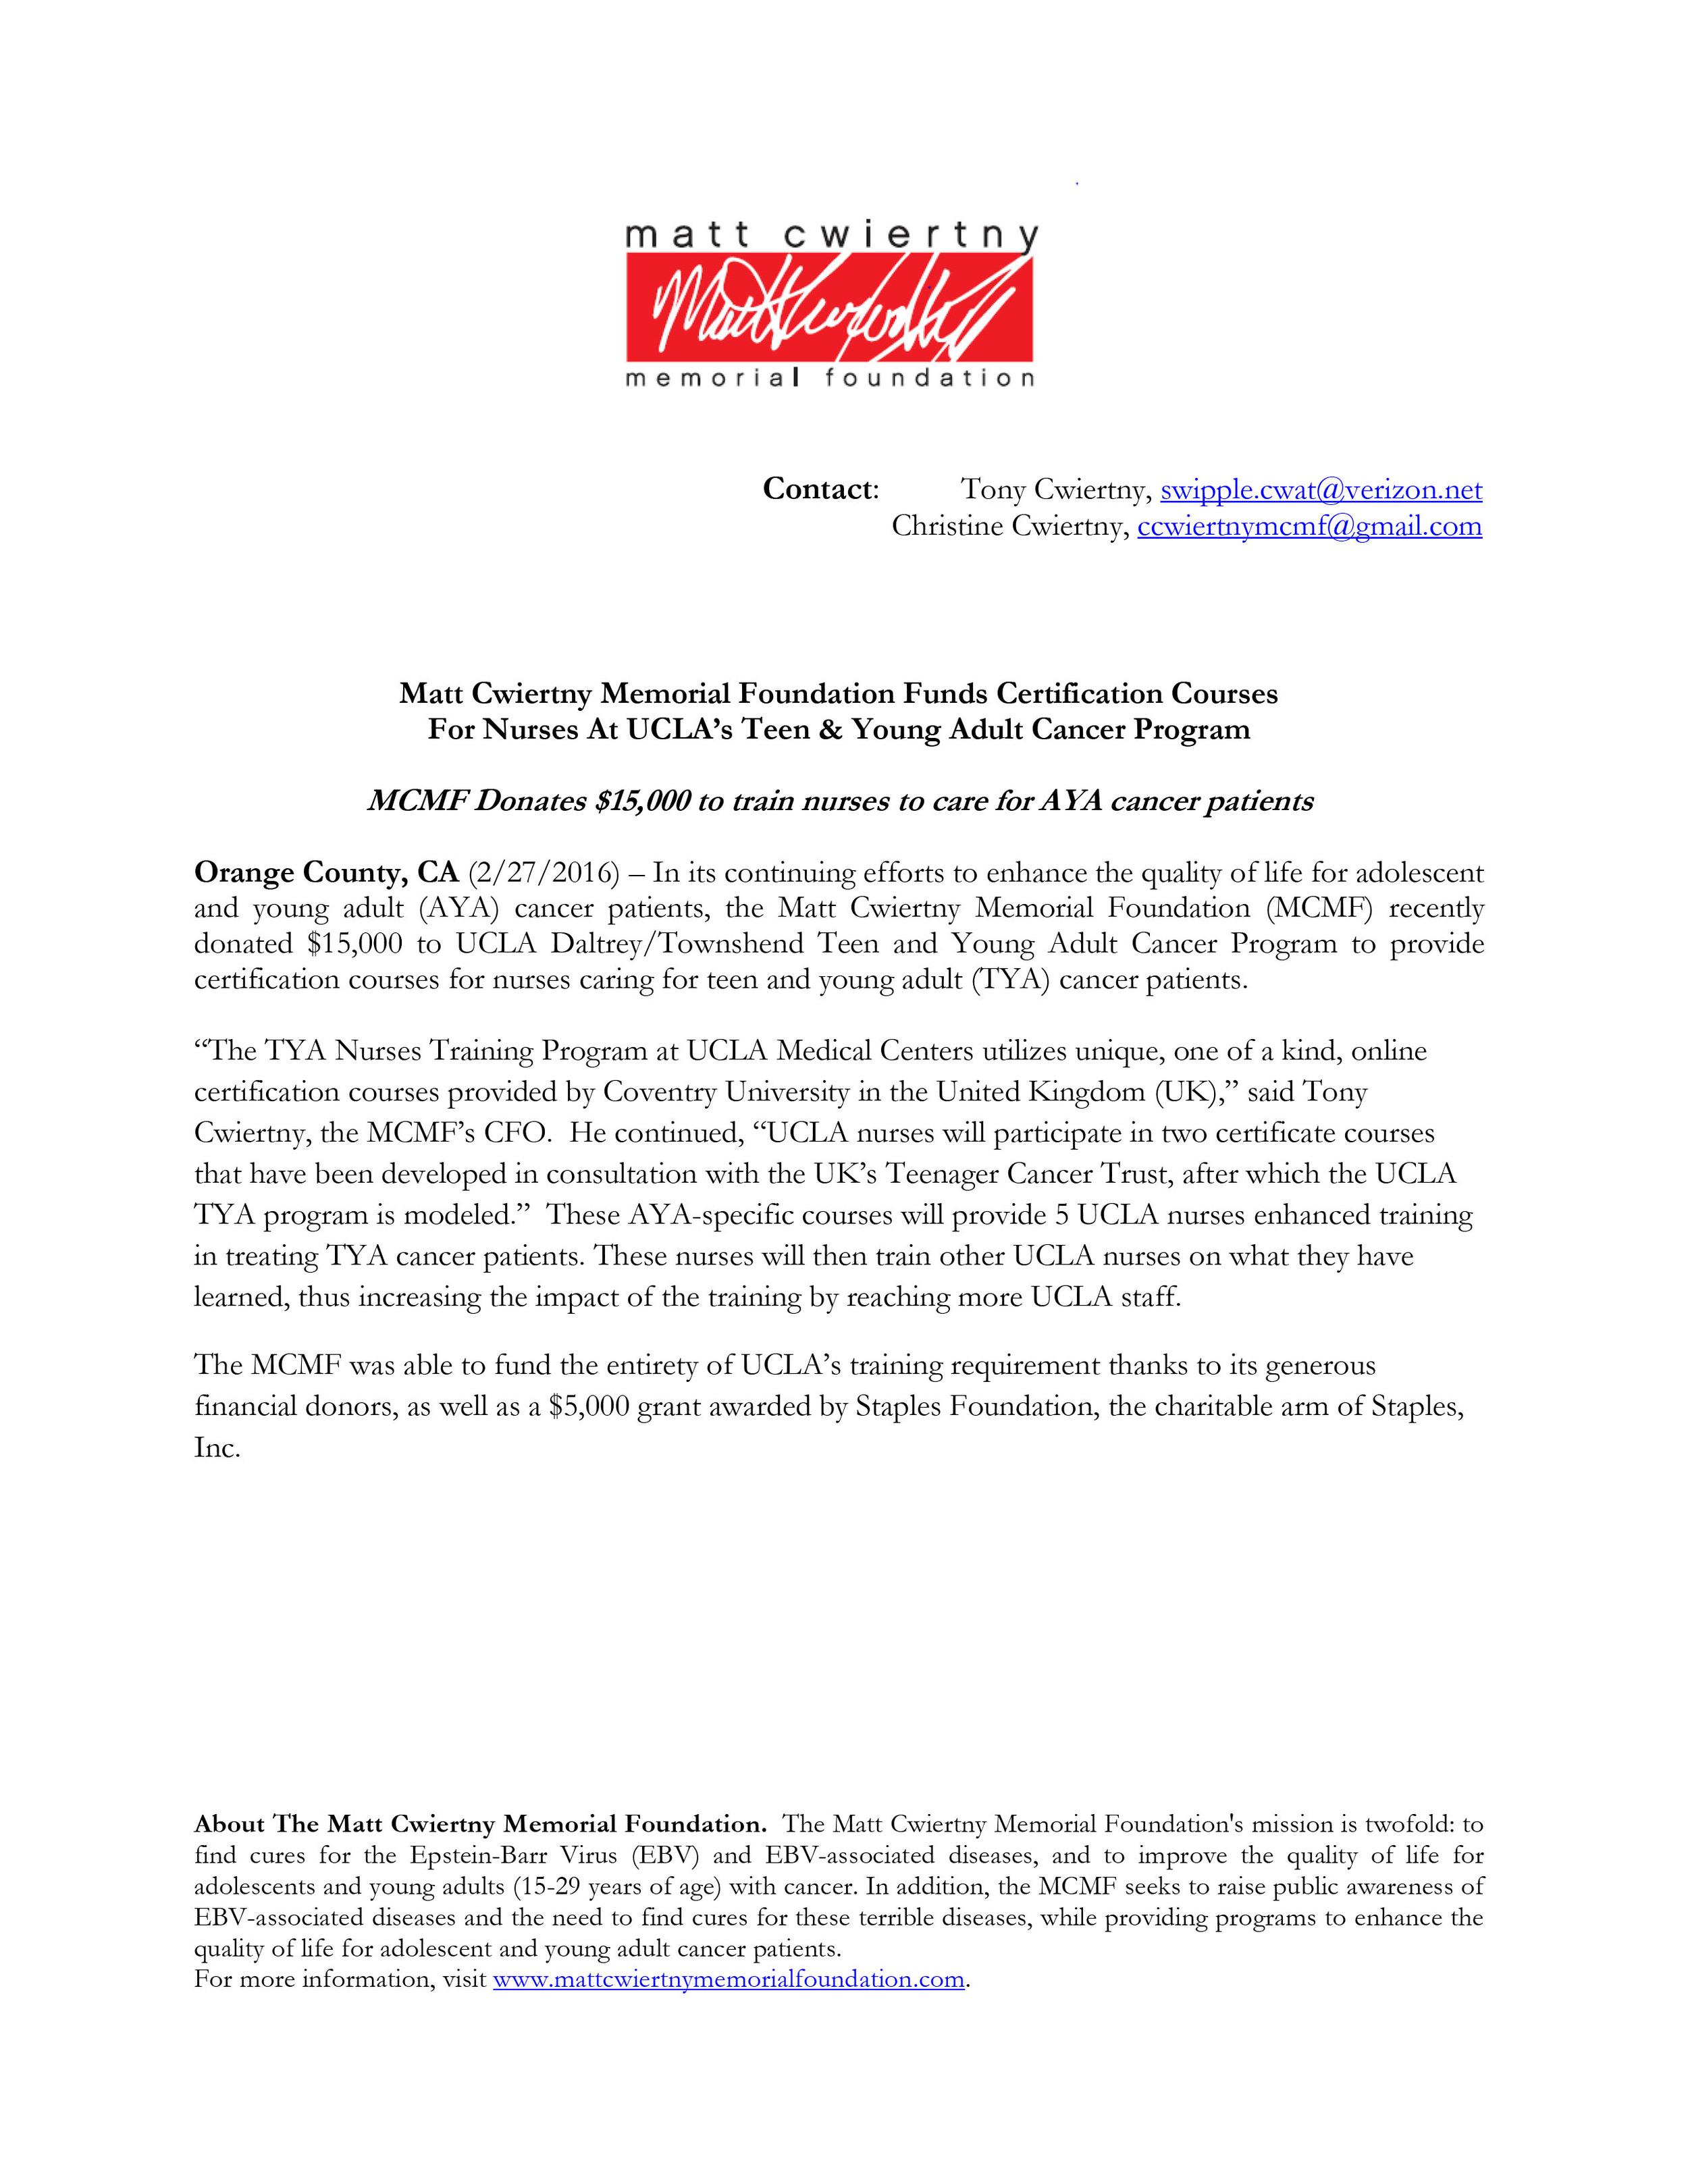 2016-2-29 - MCMF Press Release -  UCLA TYA Nurse's Training-c.jpg